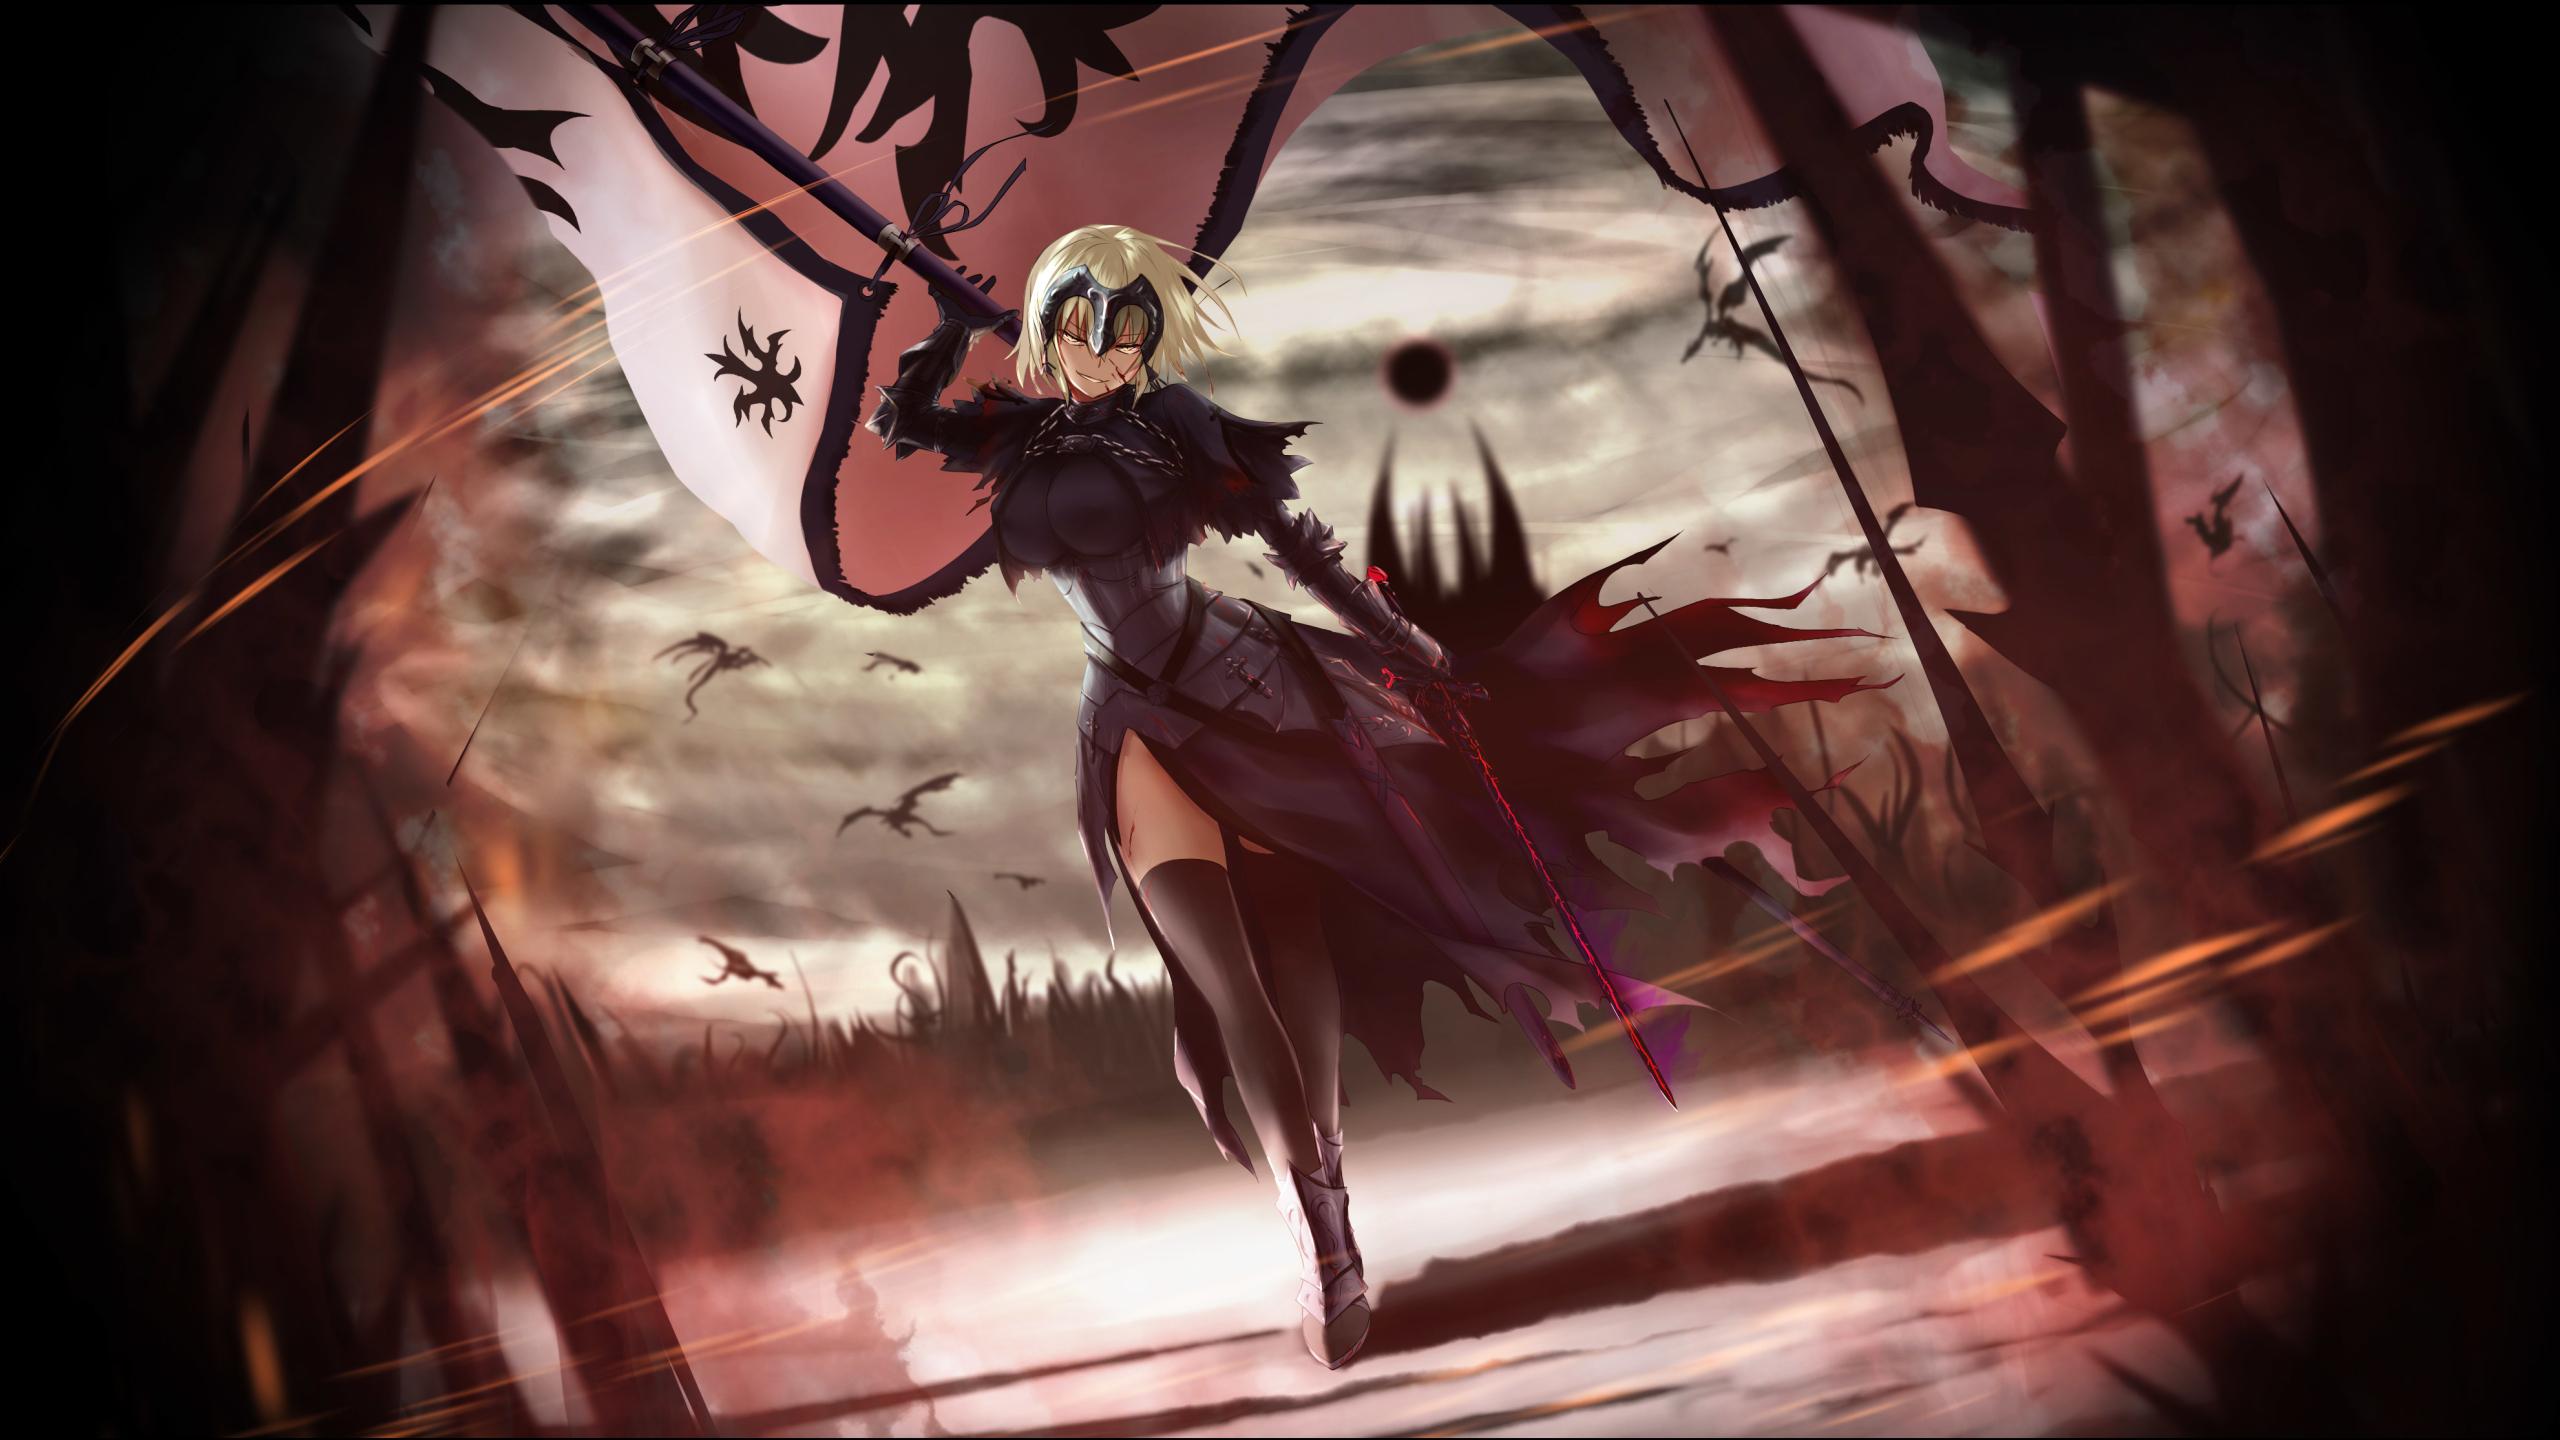 2560x1440 Anime Fate Grand Order 1440p Resolution Wallpaper Hd